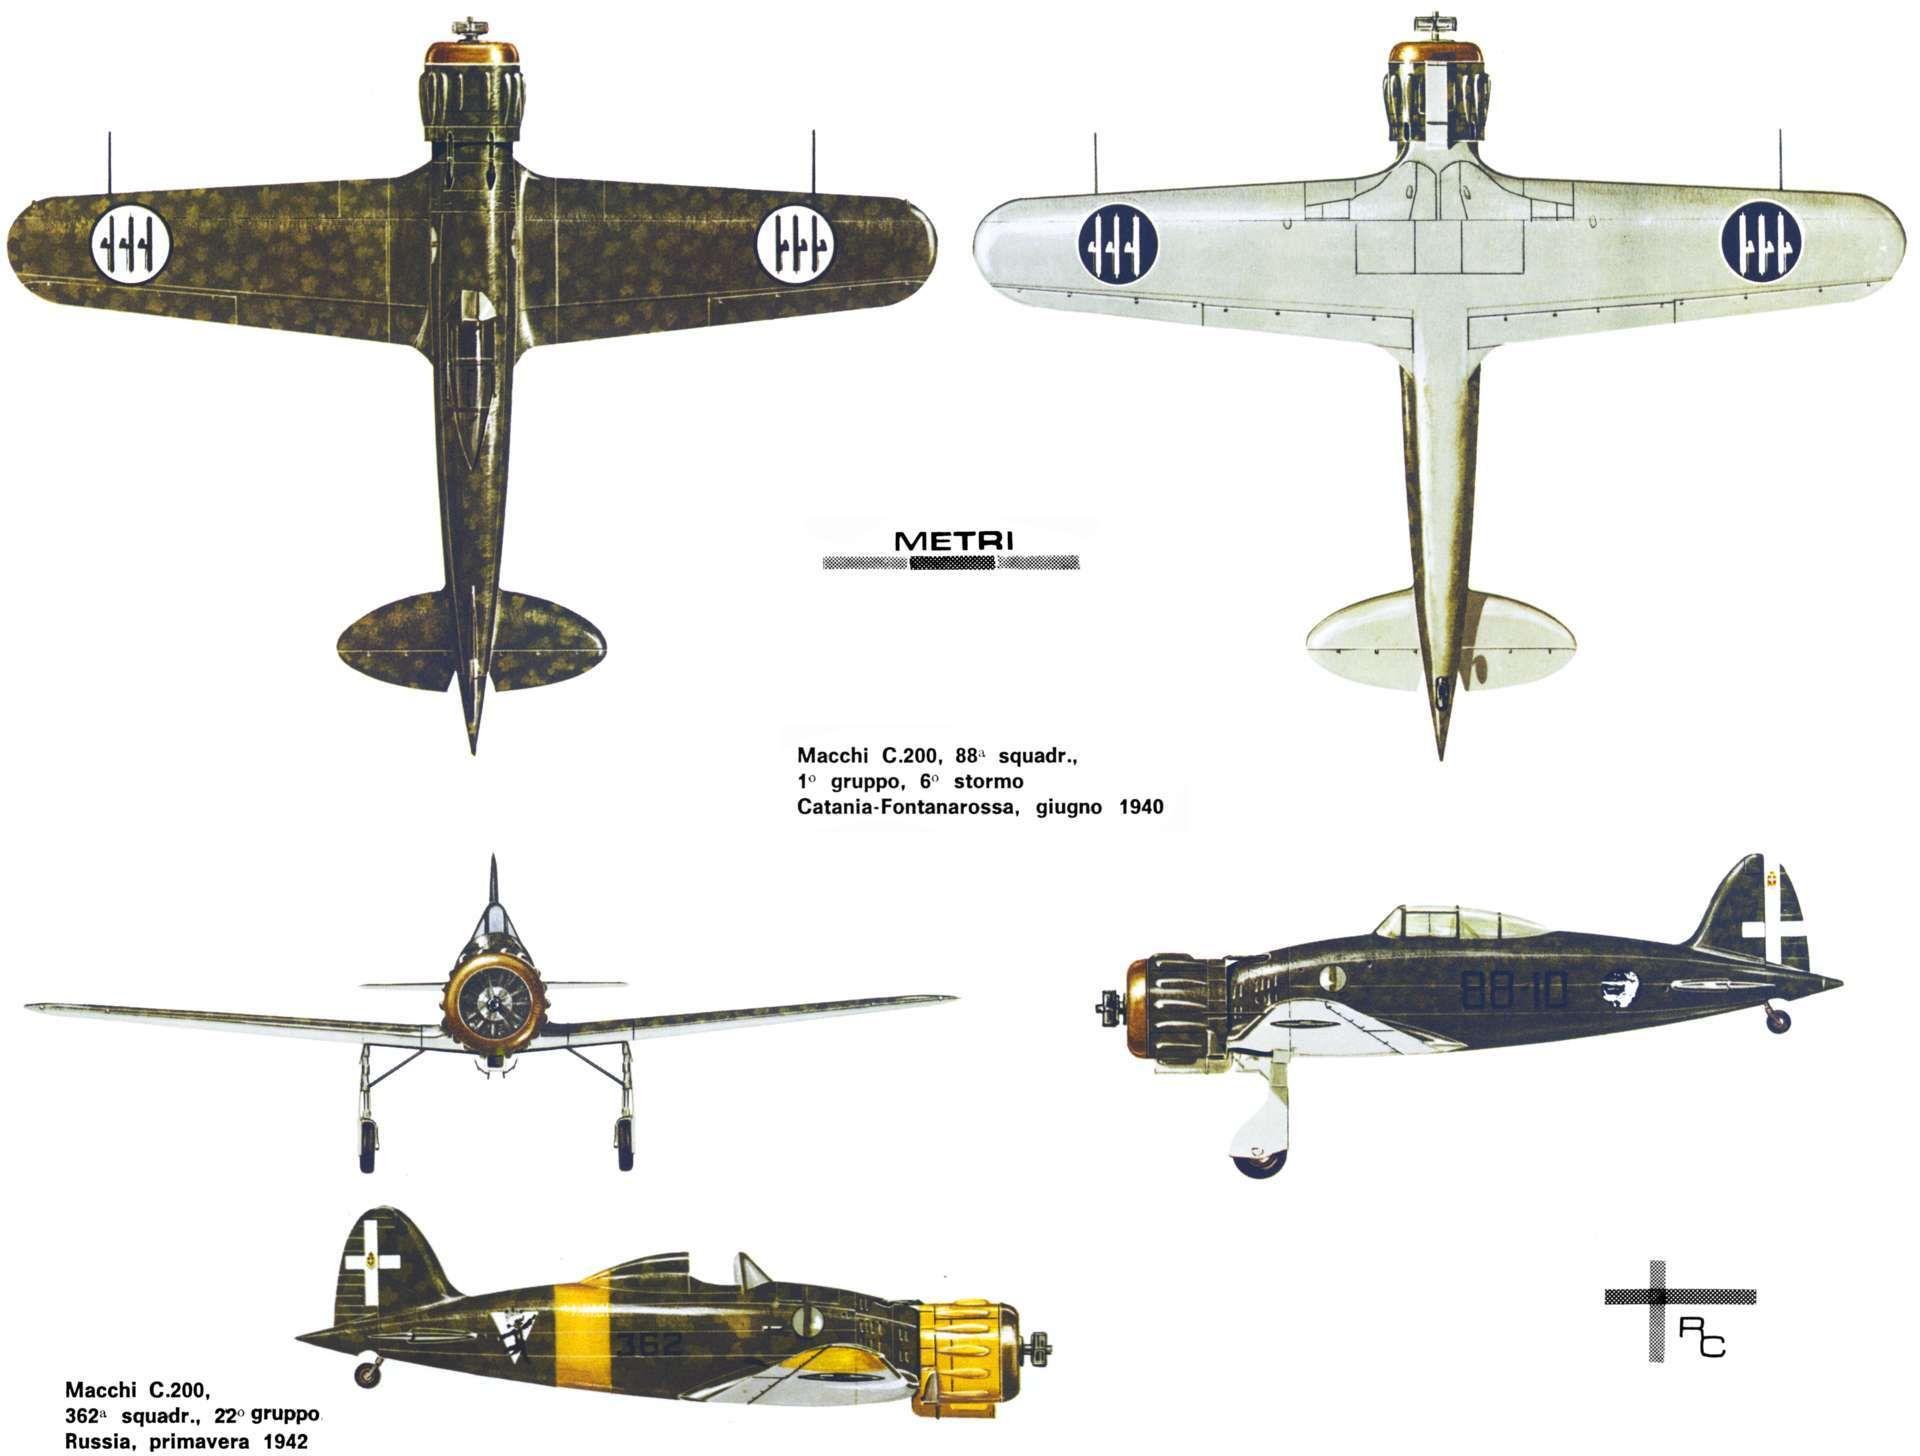 Caproni Vizzola F5 (1939) | Samoloty plansze | Pinterest | Aircraft ...